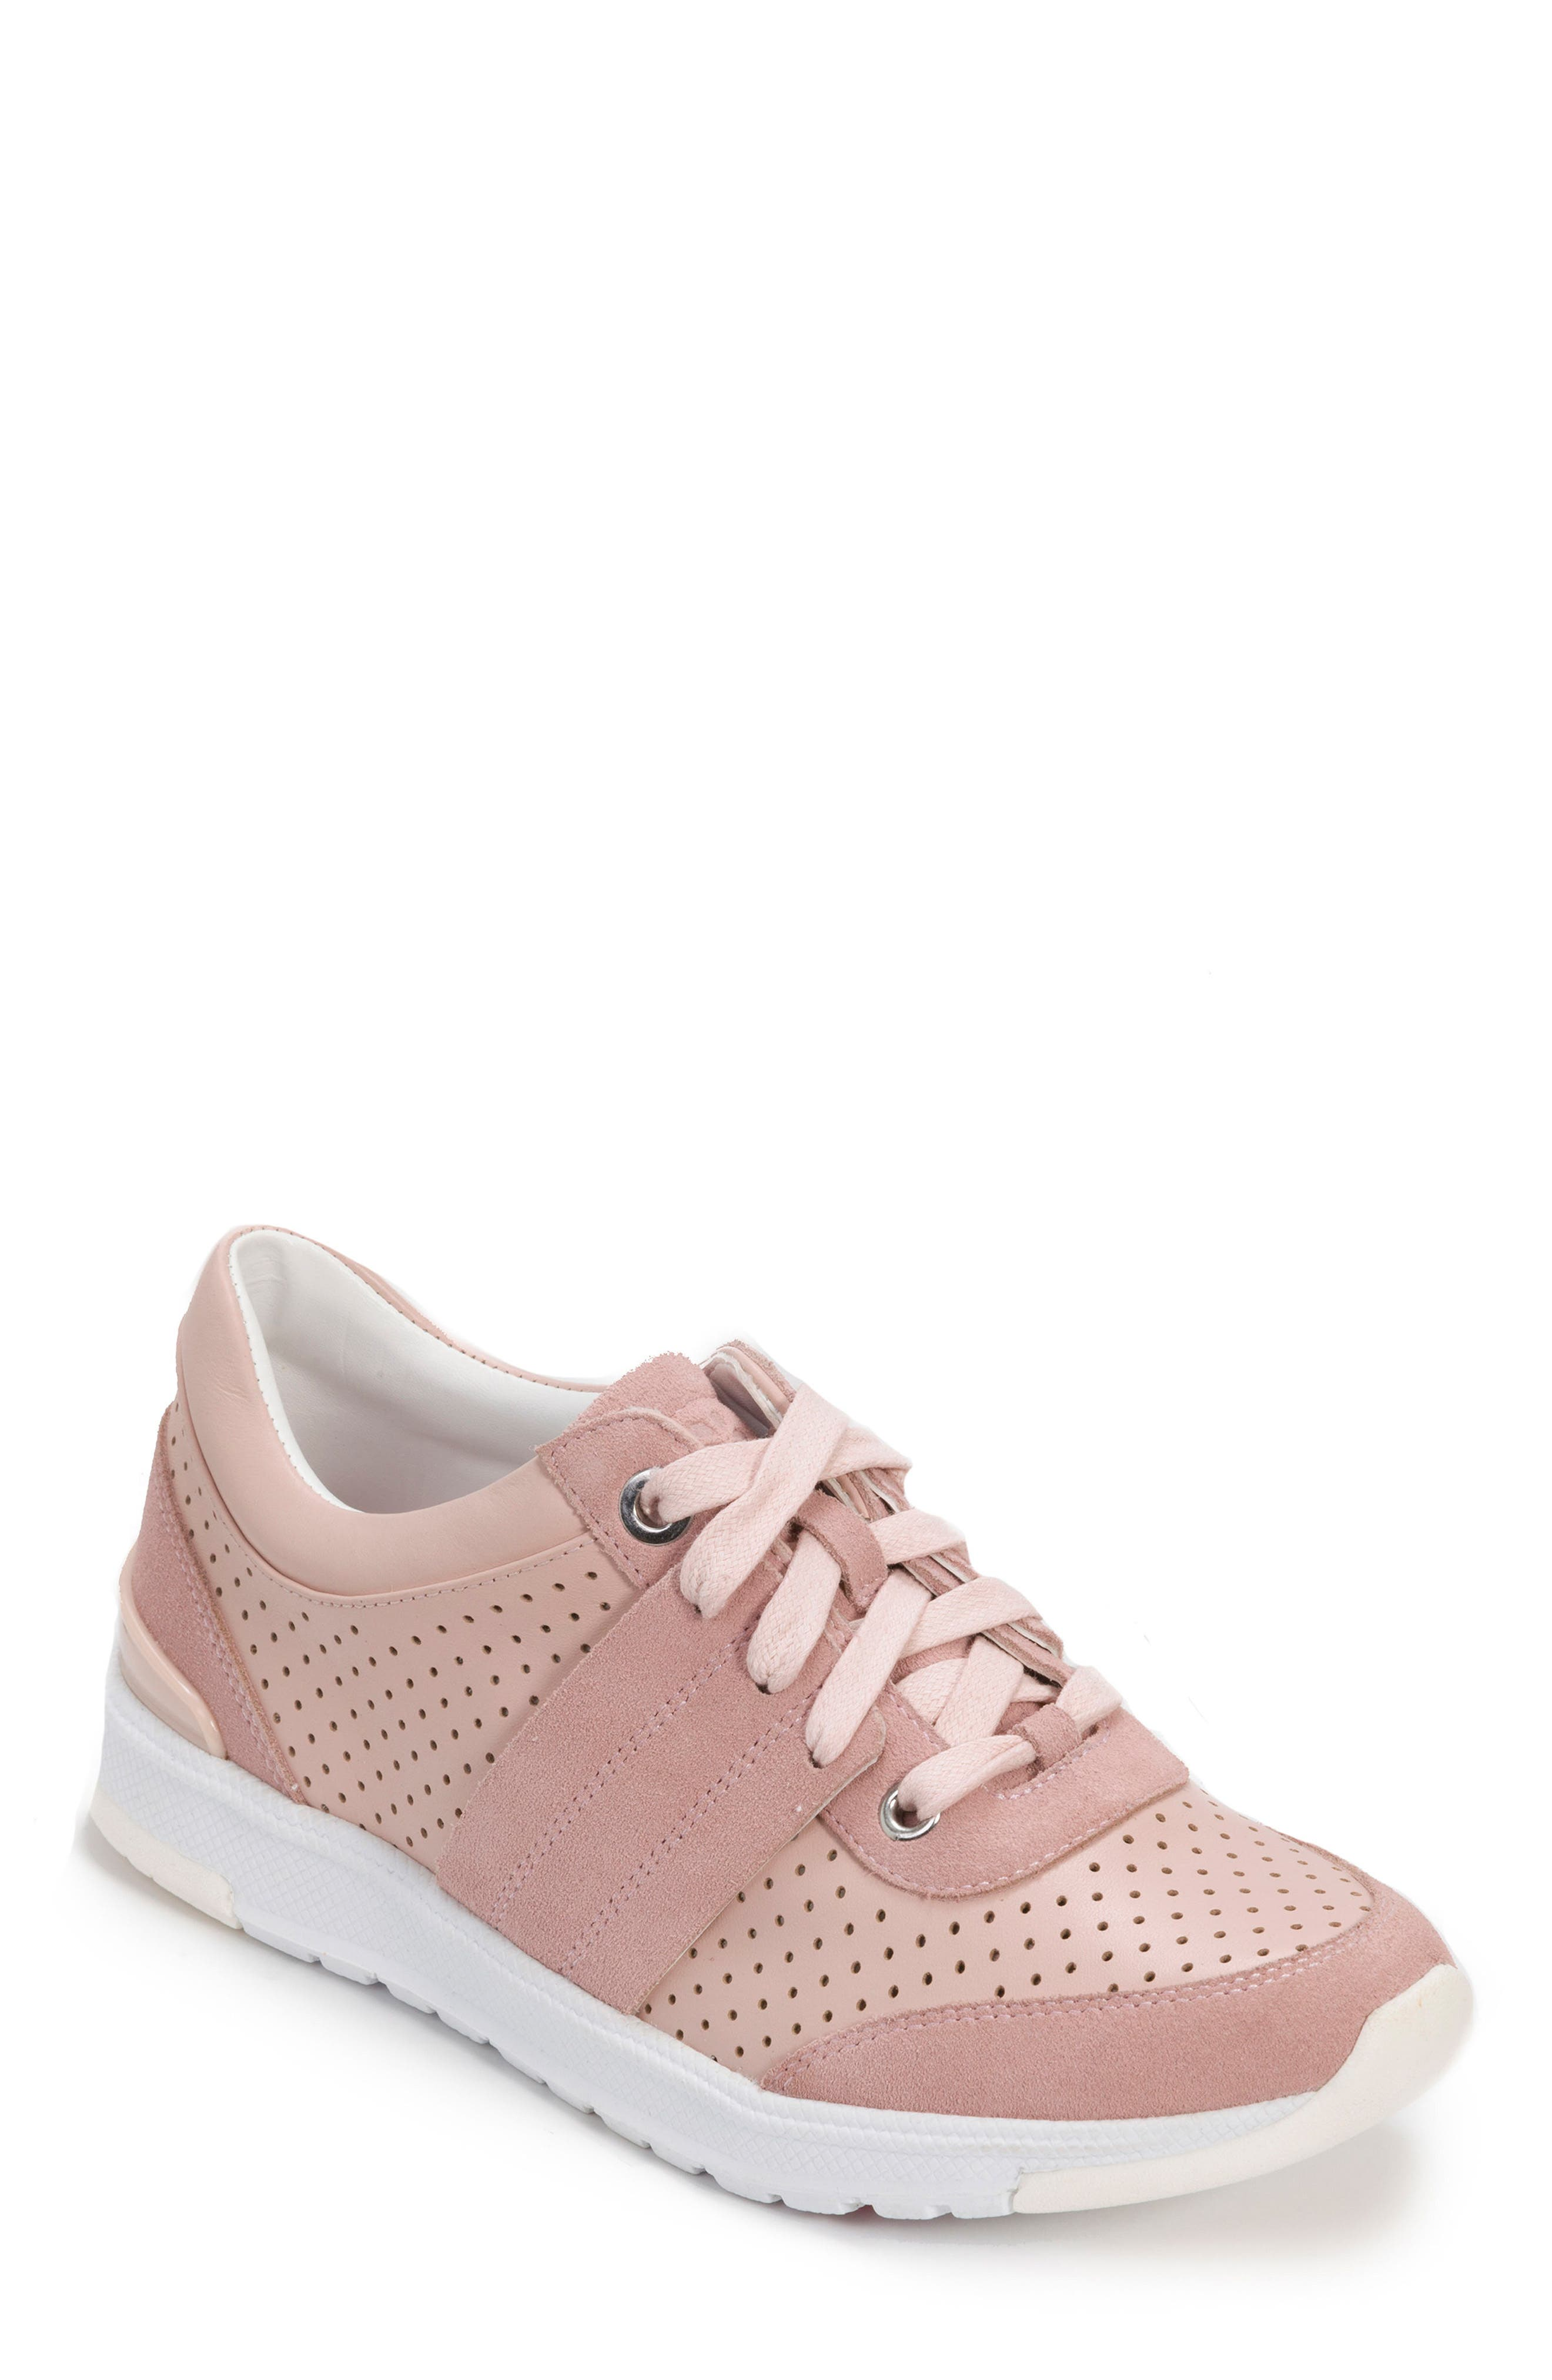 Bea Sneaker,                         Main,                         color, Blush Leather